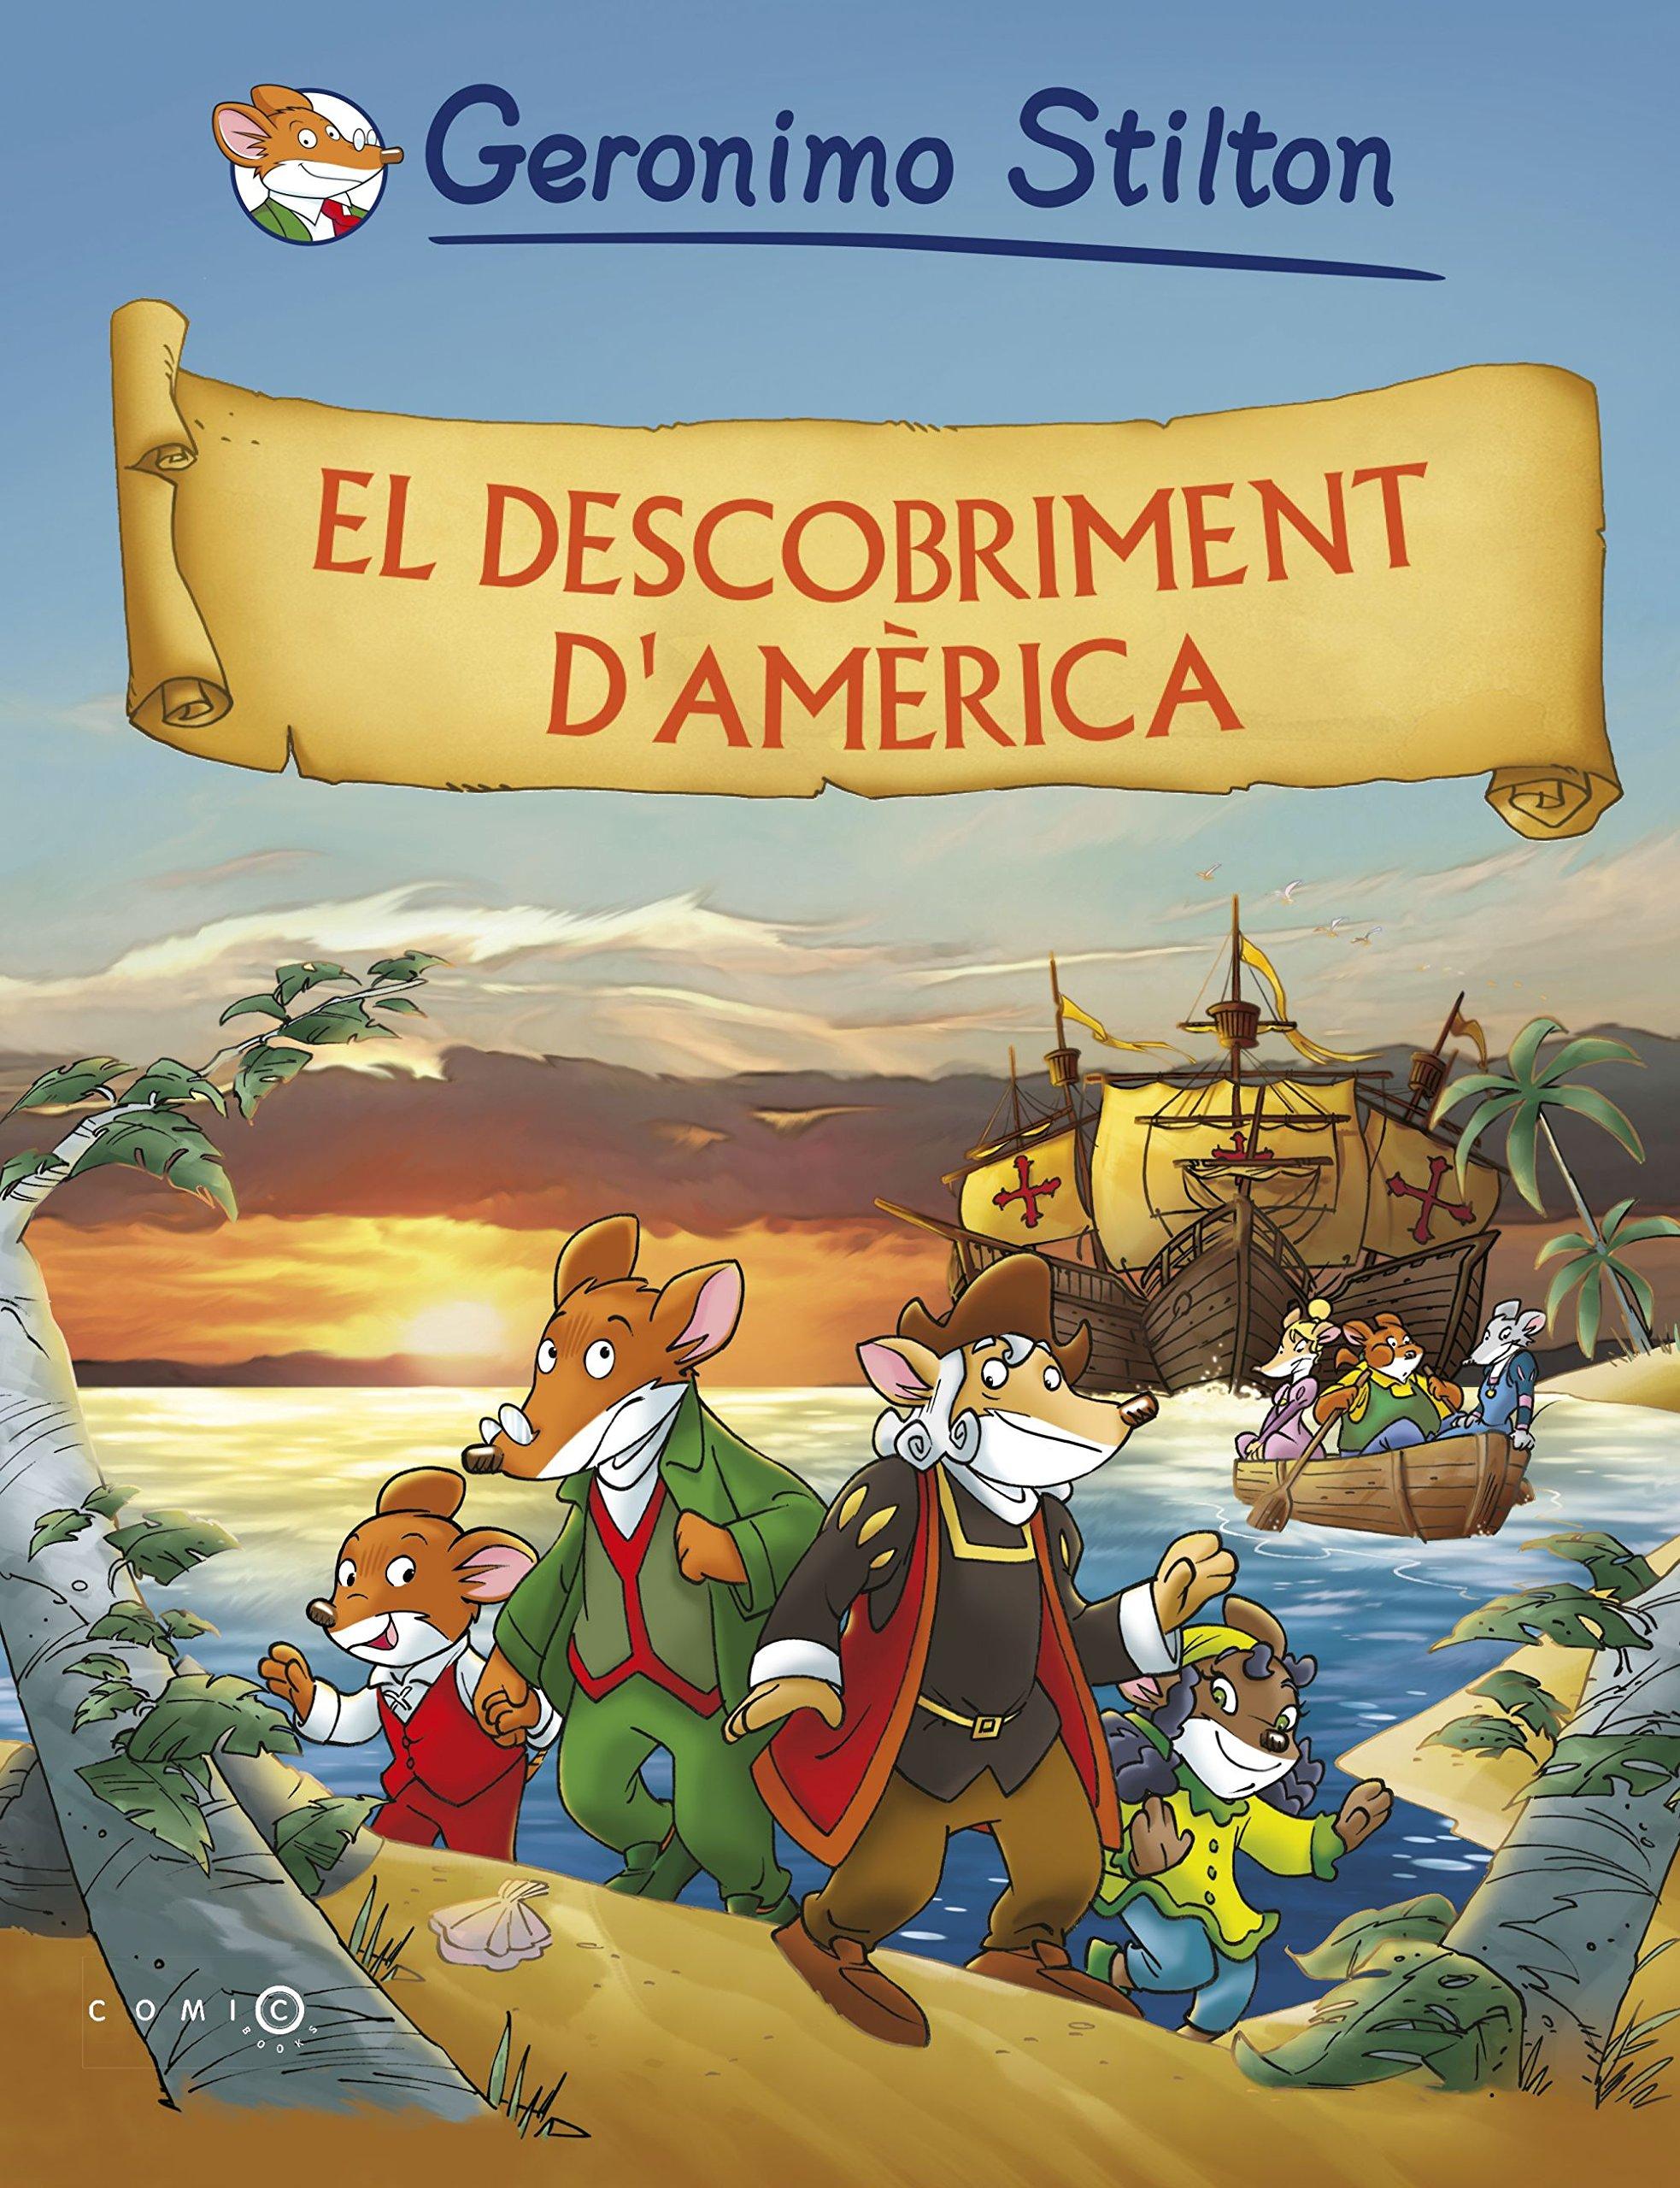 El descobriment dAmèrica (Comic Books): Amazon.es: Stilton ...